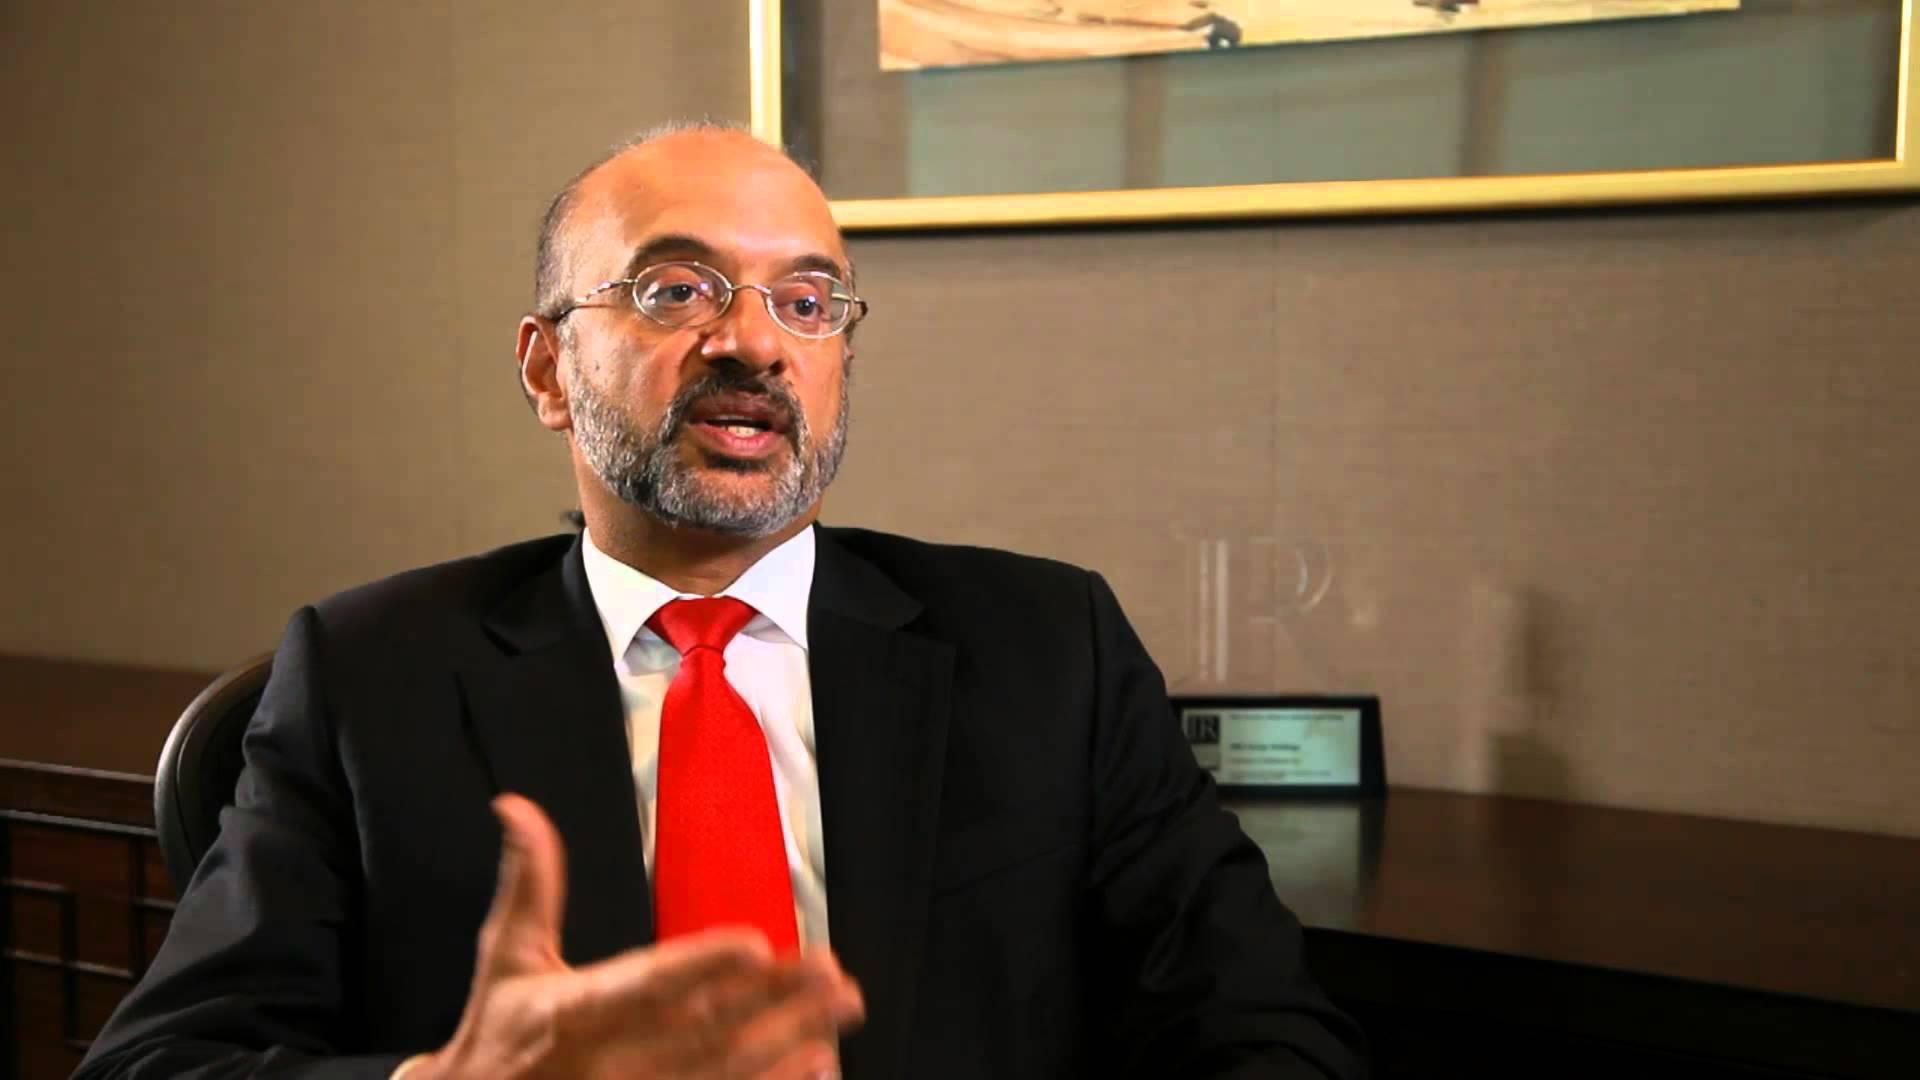 Piyush Gupta, CEO & Director, DBS Group